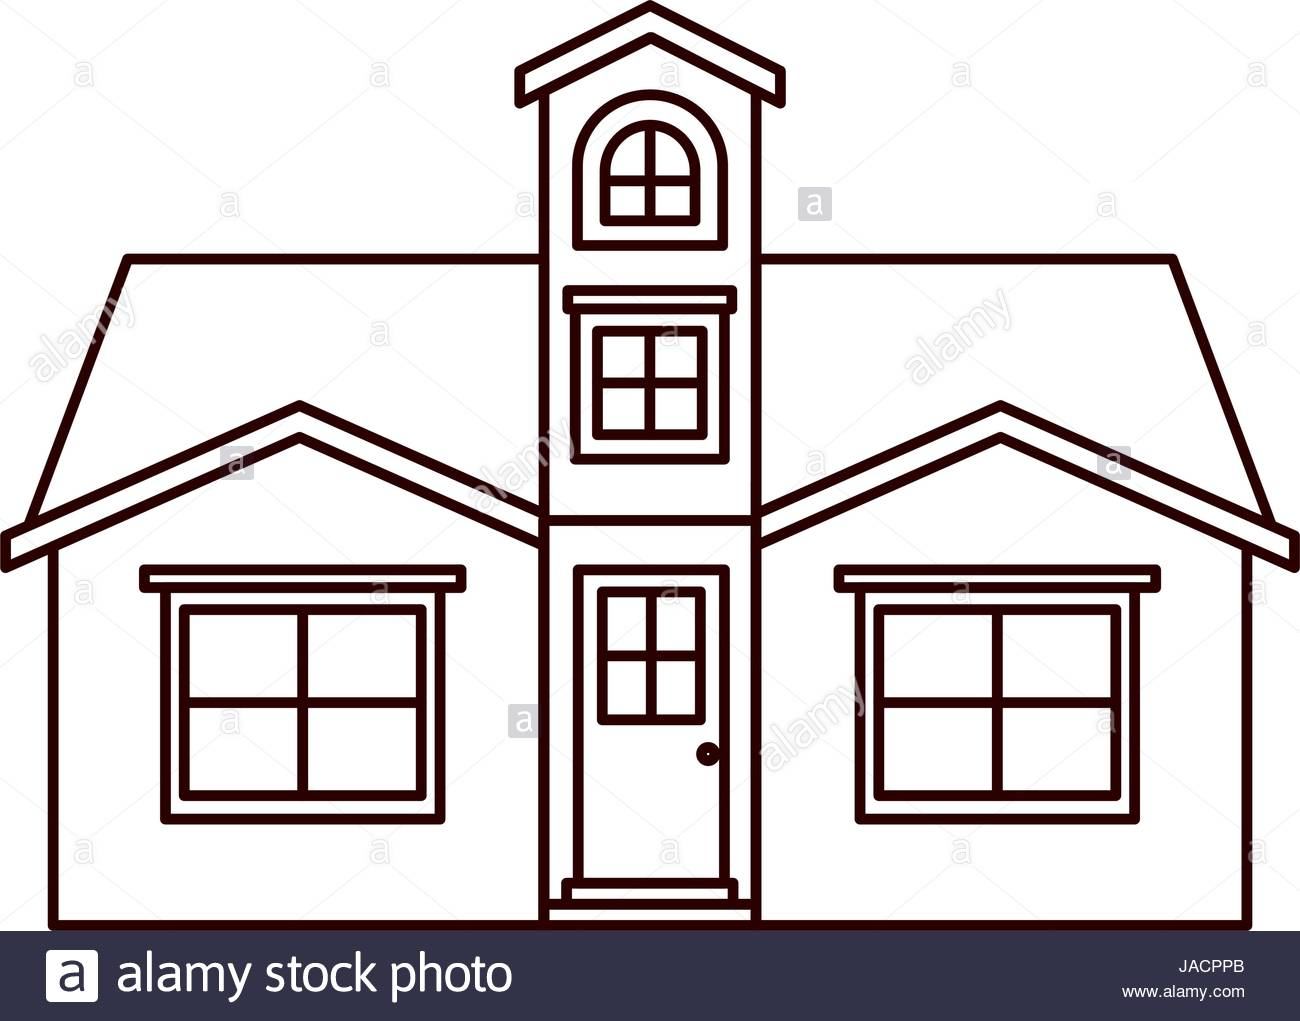 1300x1021 Monochrome Silhouette Facade House With Attic Stock Vector Art